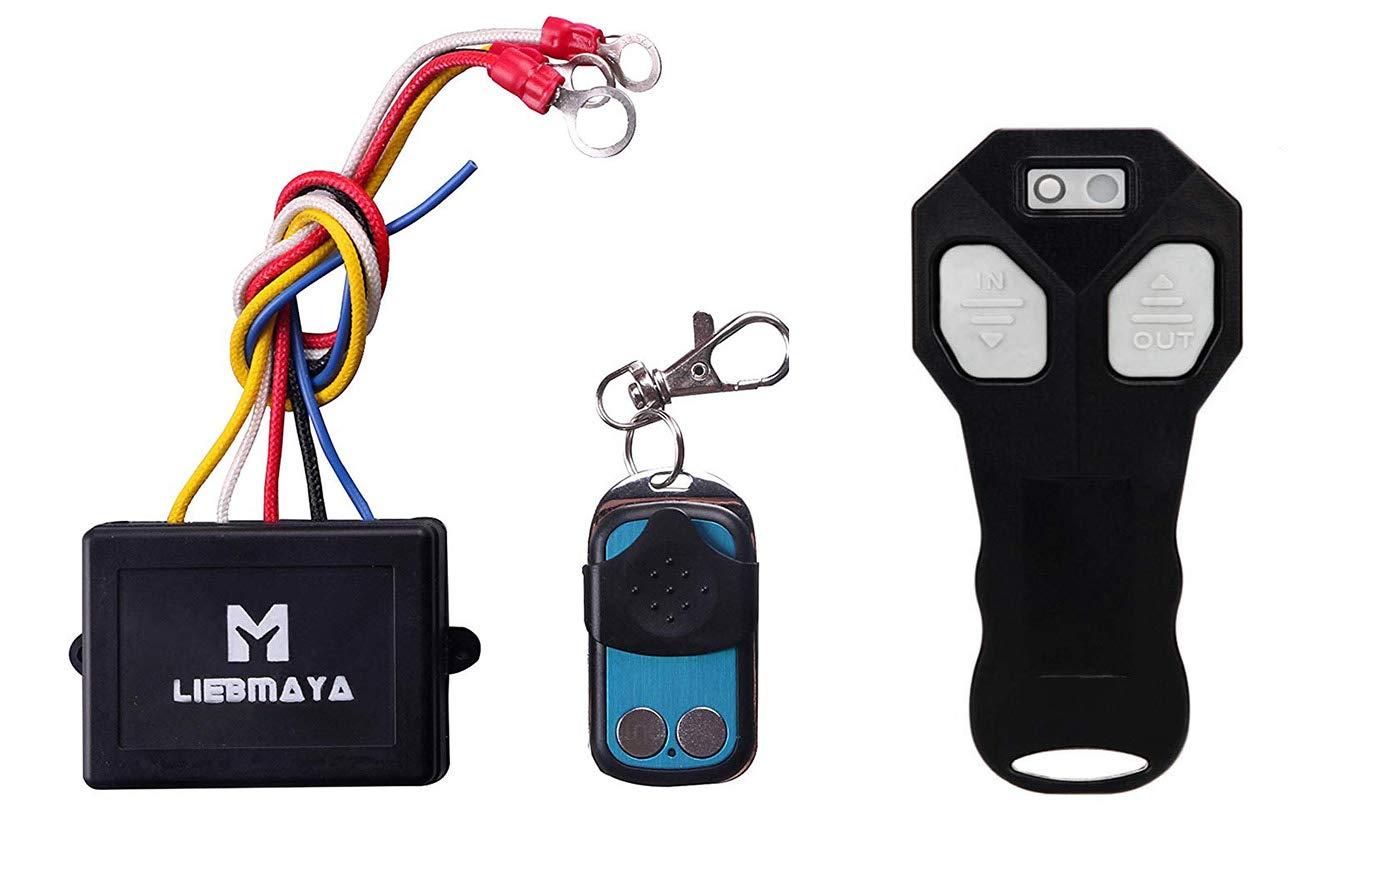 LIEBMAYA Set 2 Telecomando Wireless Per Verricello Camion Jeep DC12V Senza Fili Ottima JEEP ATV 12V impermeabile